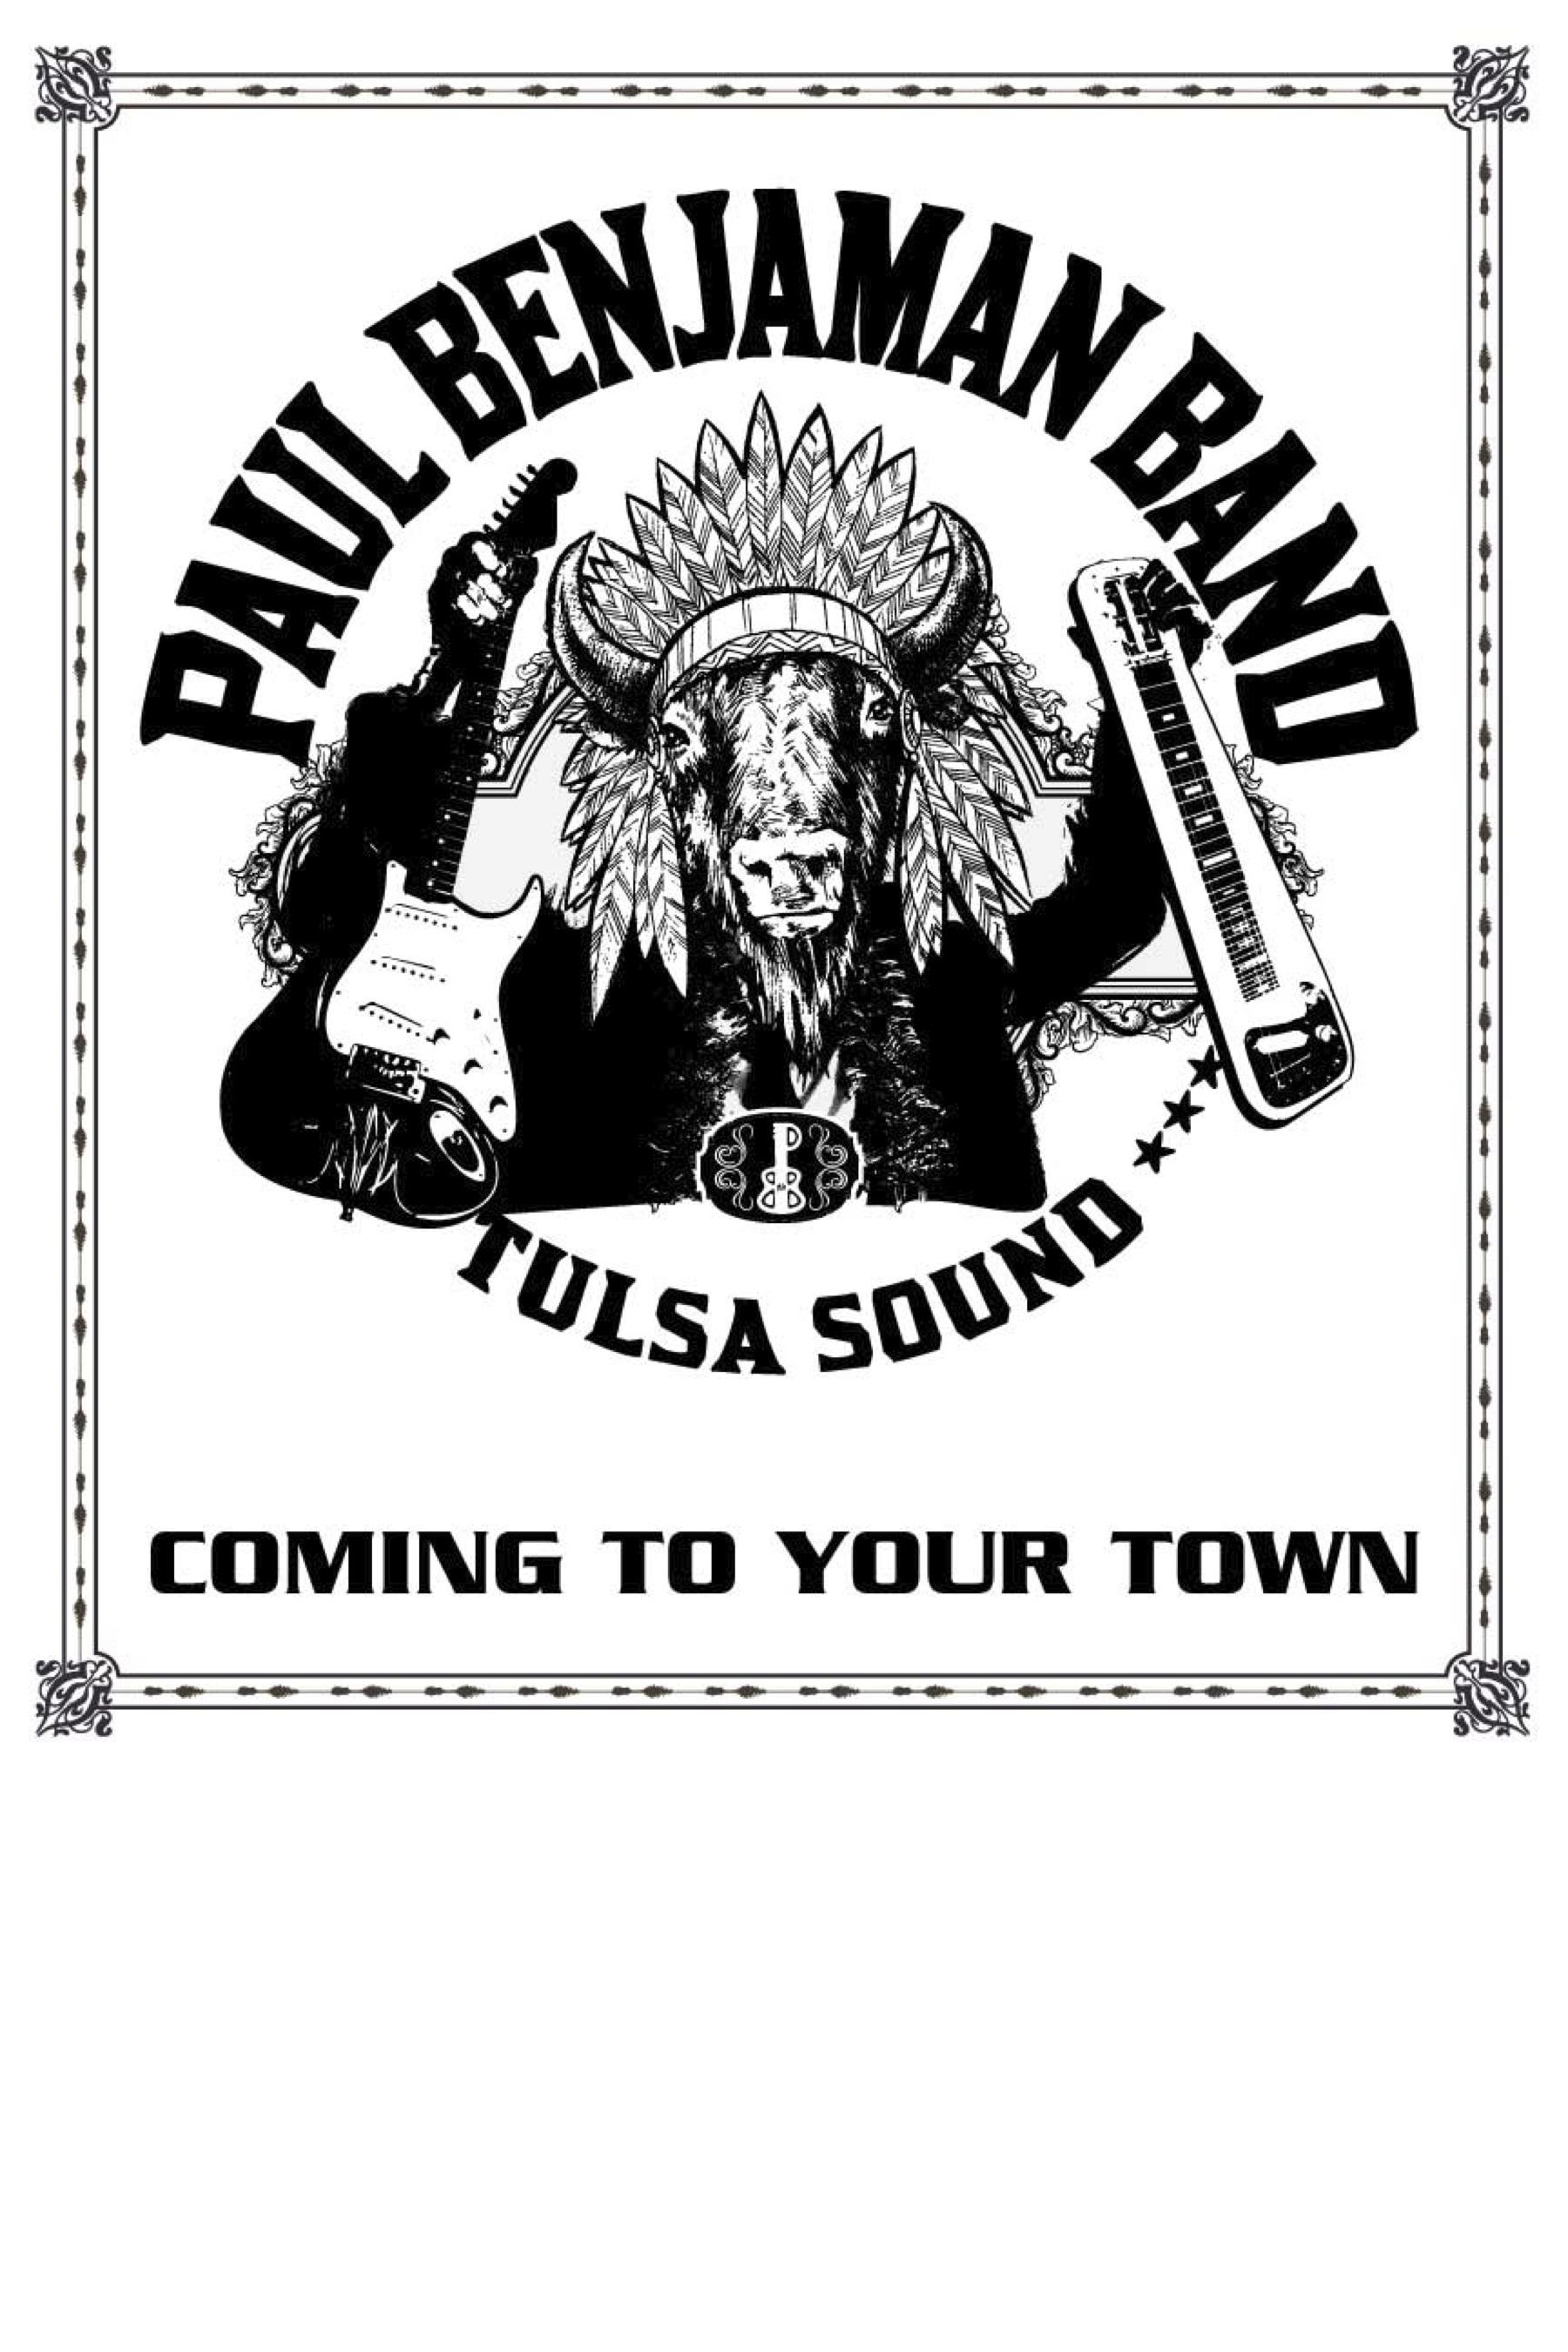 PBB Buffalo Tour Poster copy.jpg